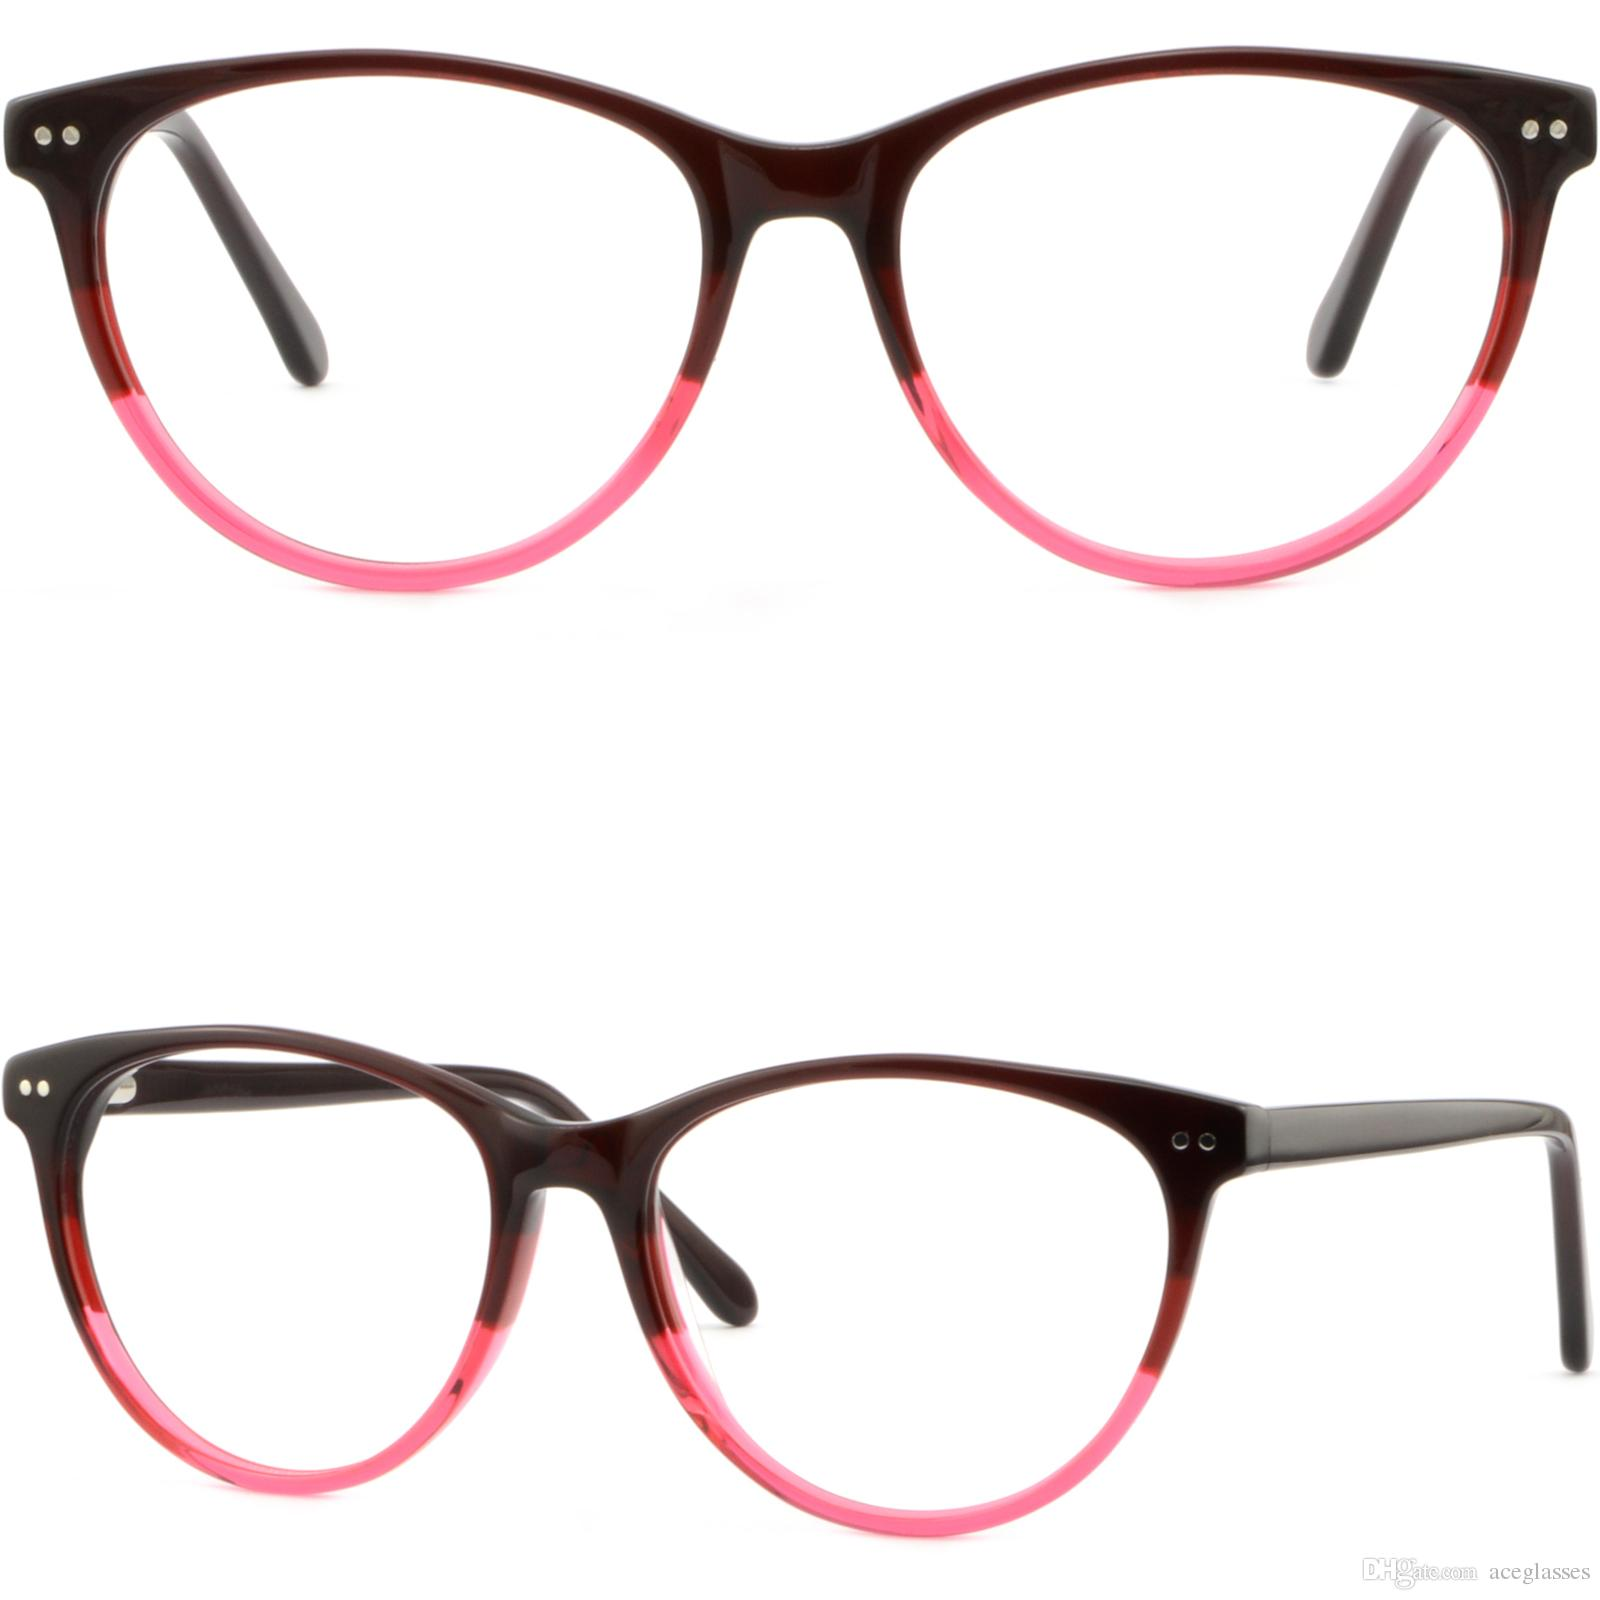 ffe565e6b02 Thin Light Plastic Frame Spring Hinges Women s Glasses Shiny Silver ...